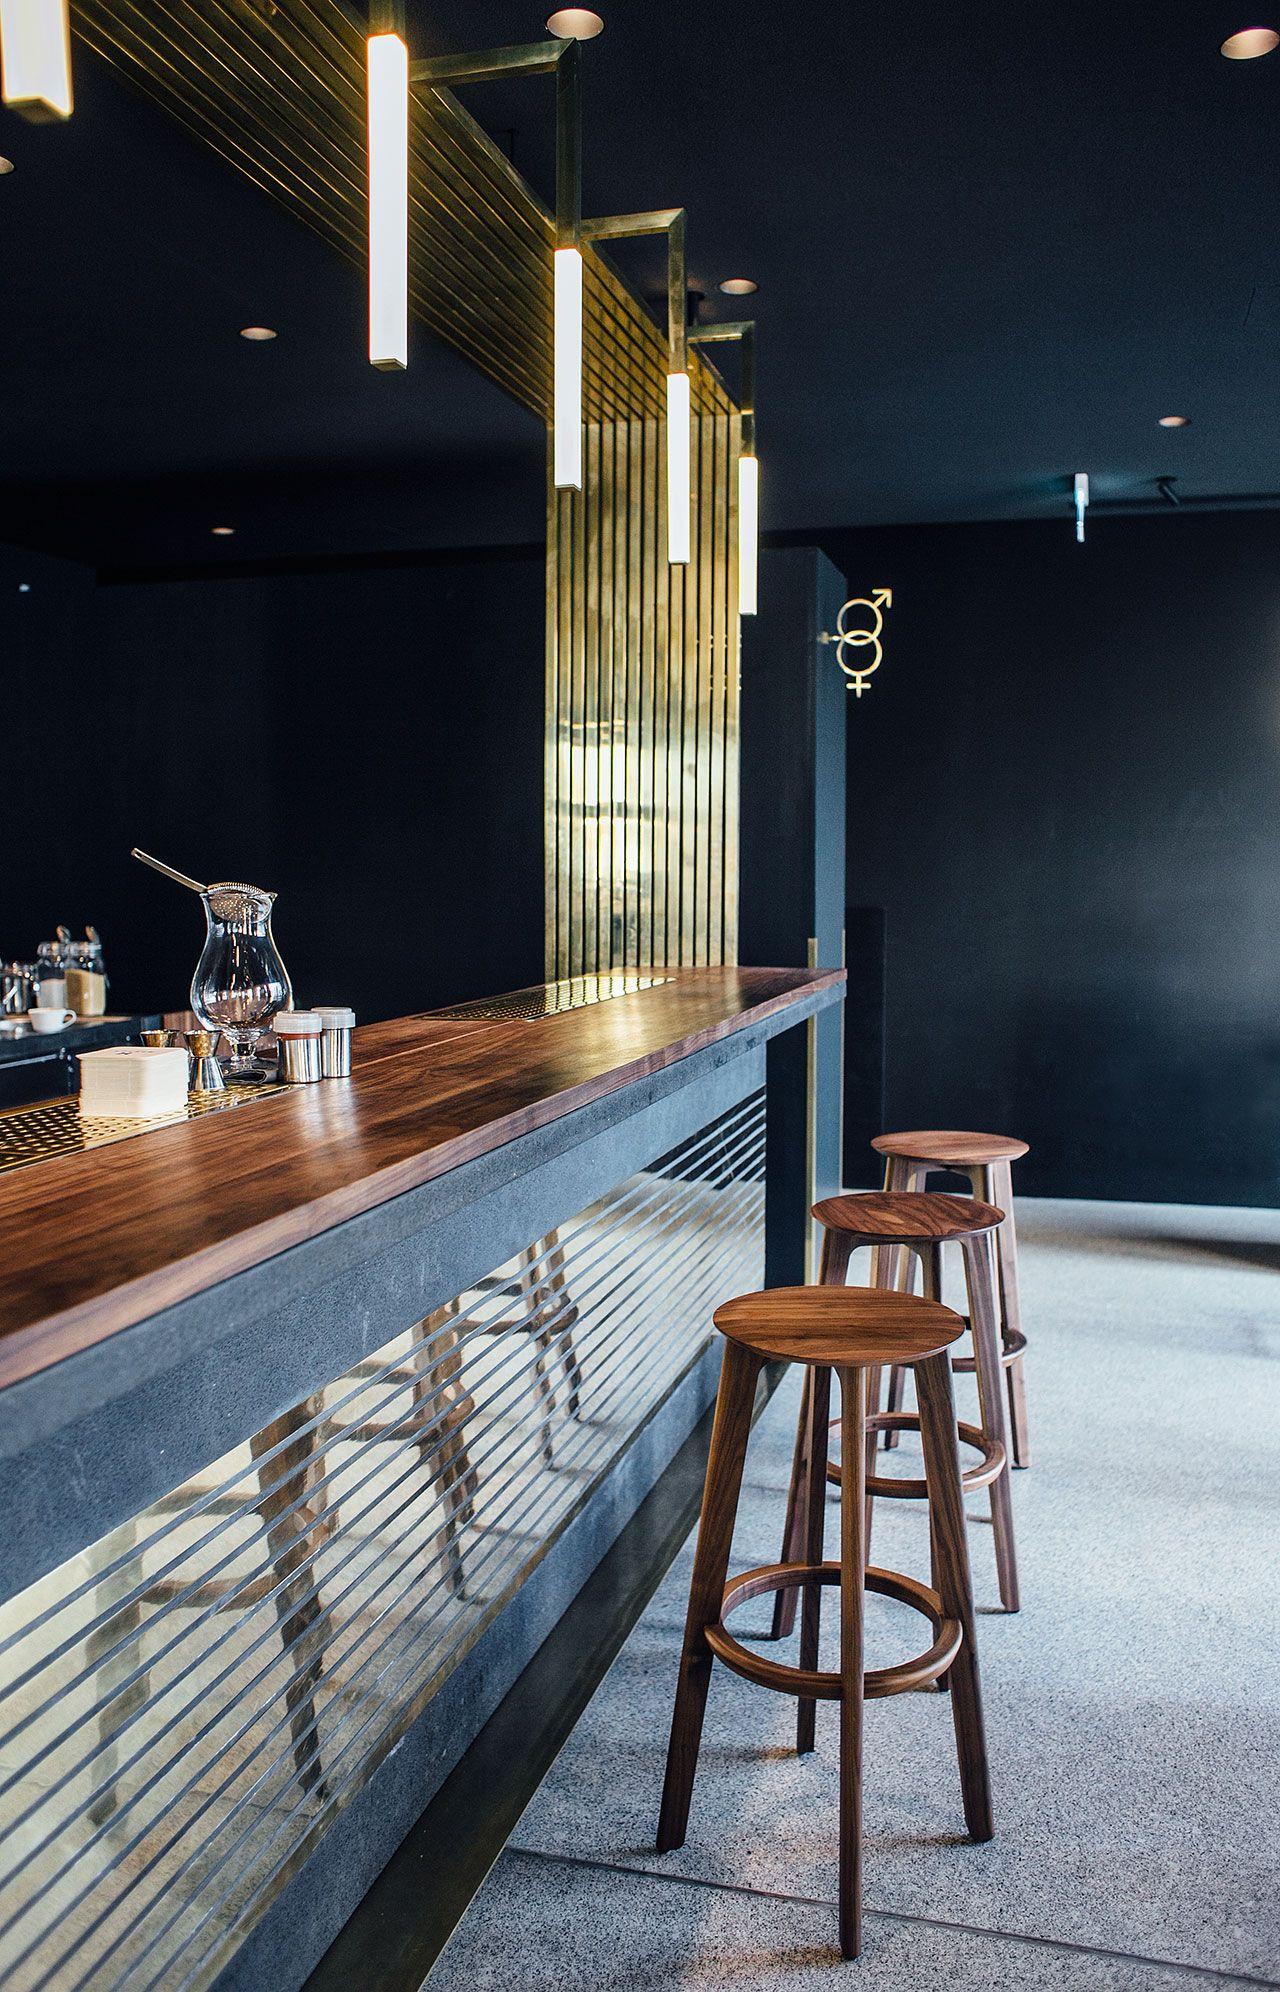 midcentury timeless touches dramatically frame the modern bar in munich - Midcentury Restaurant Interior